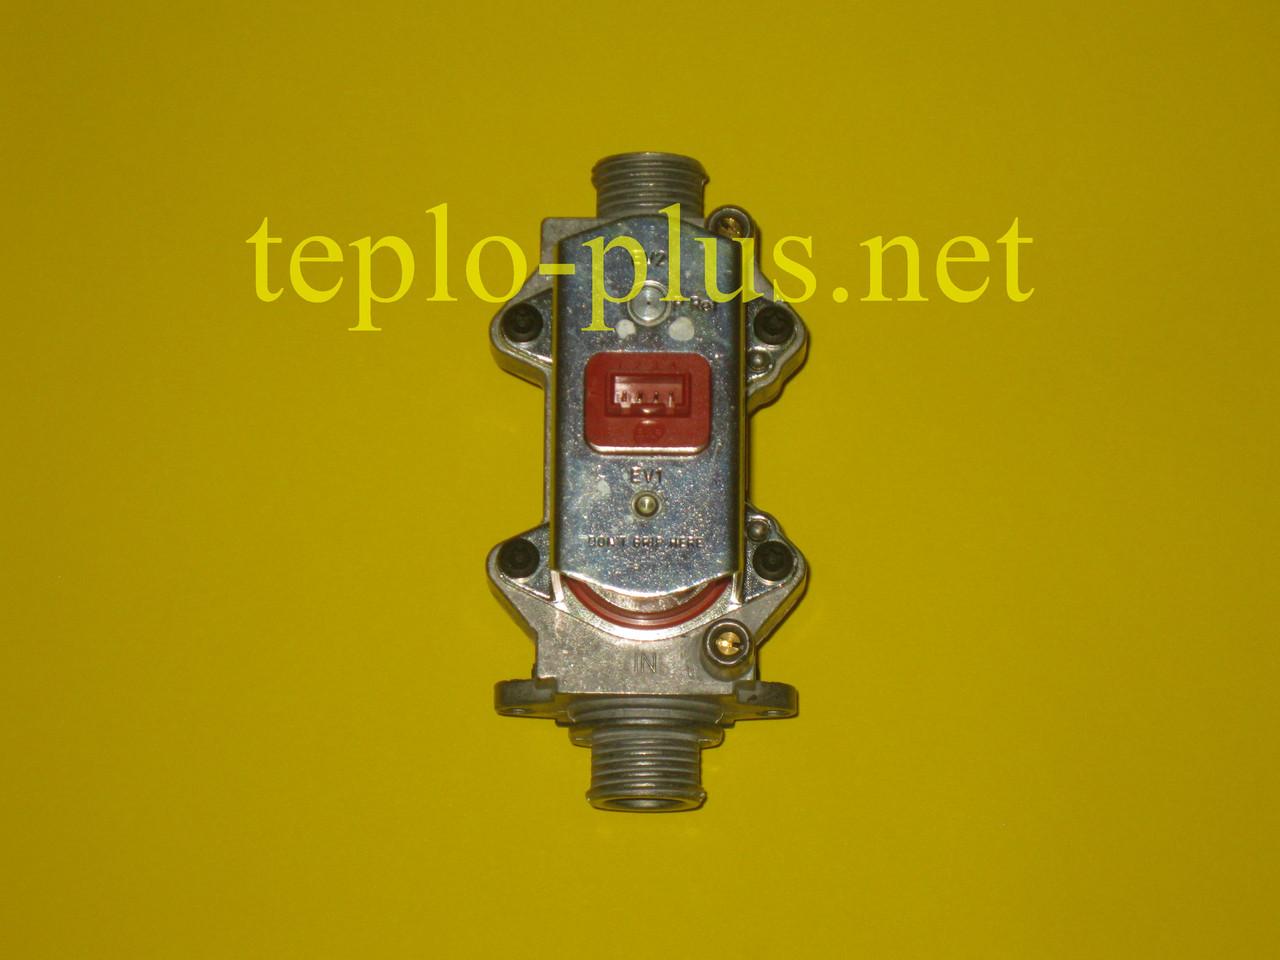 Газовый клапан 39841320 Ferroli Domiproject D, FerEasy D, Domitech D, Divatech C24D